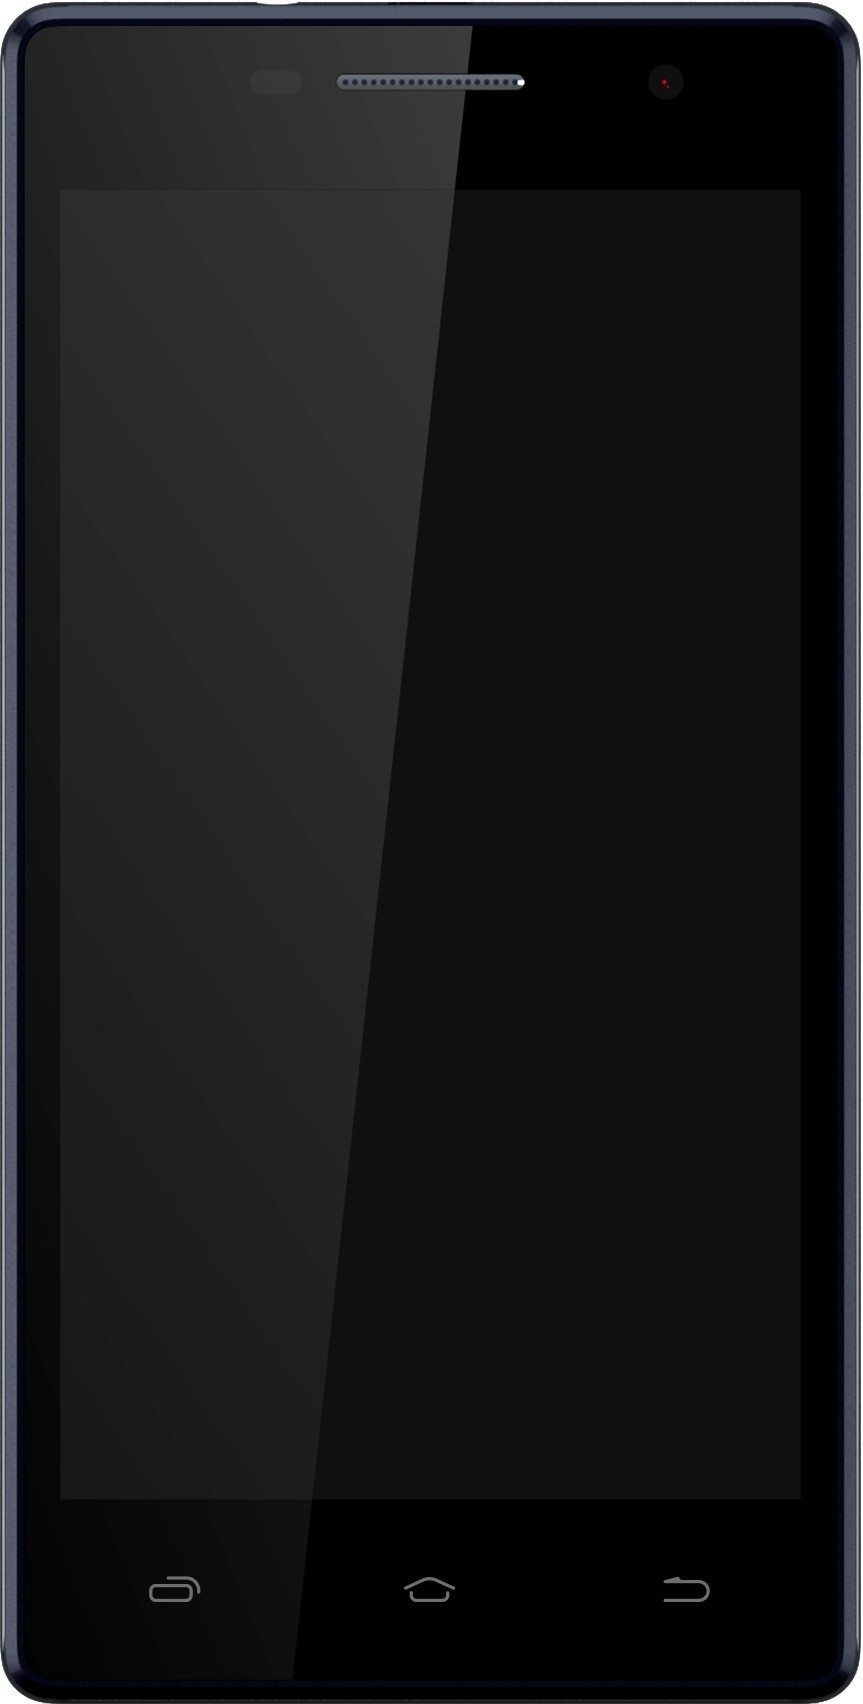 Intex Aqua Desire HD (1GB RAM, 8GB)